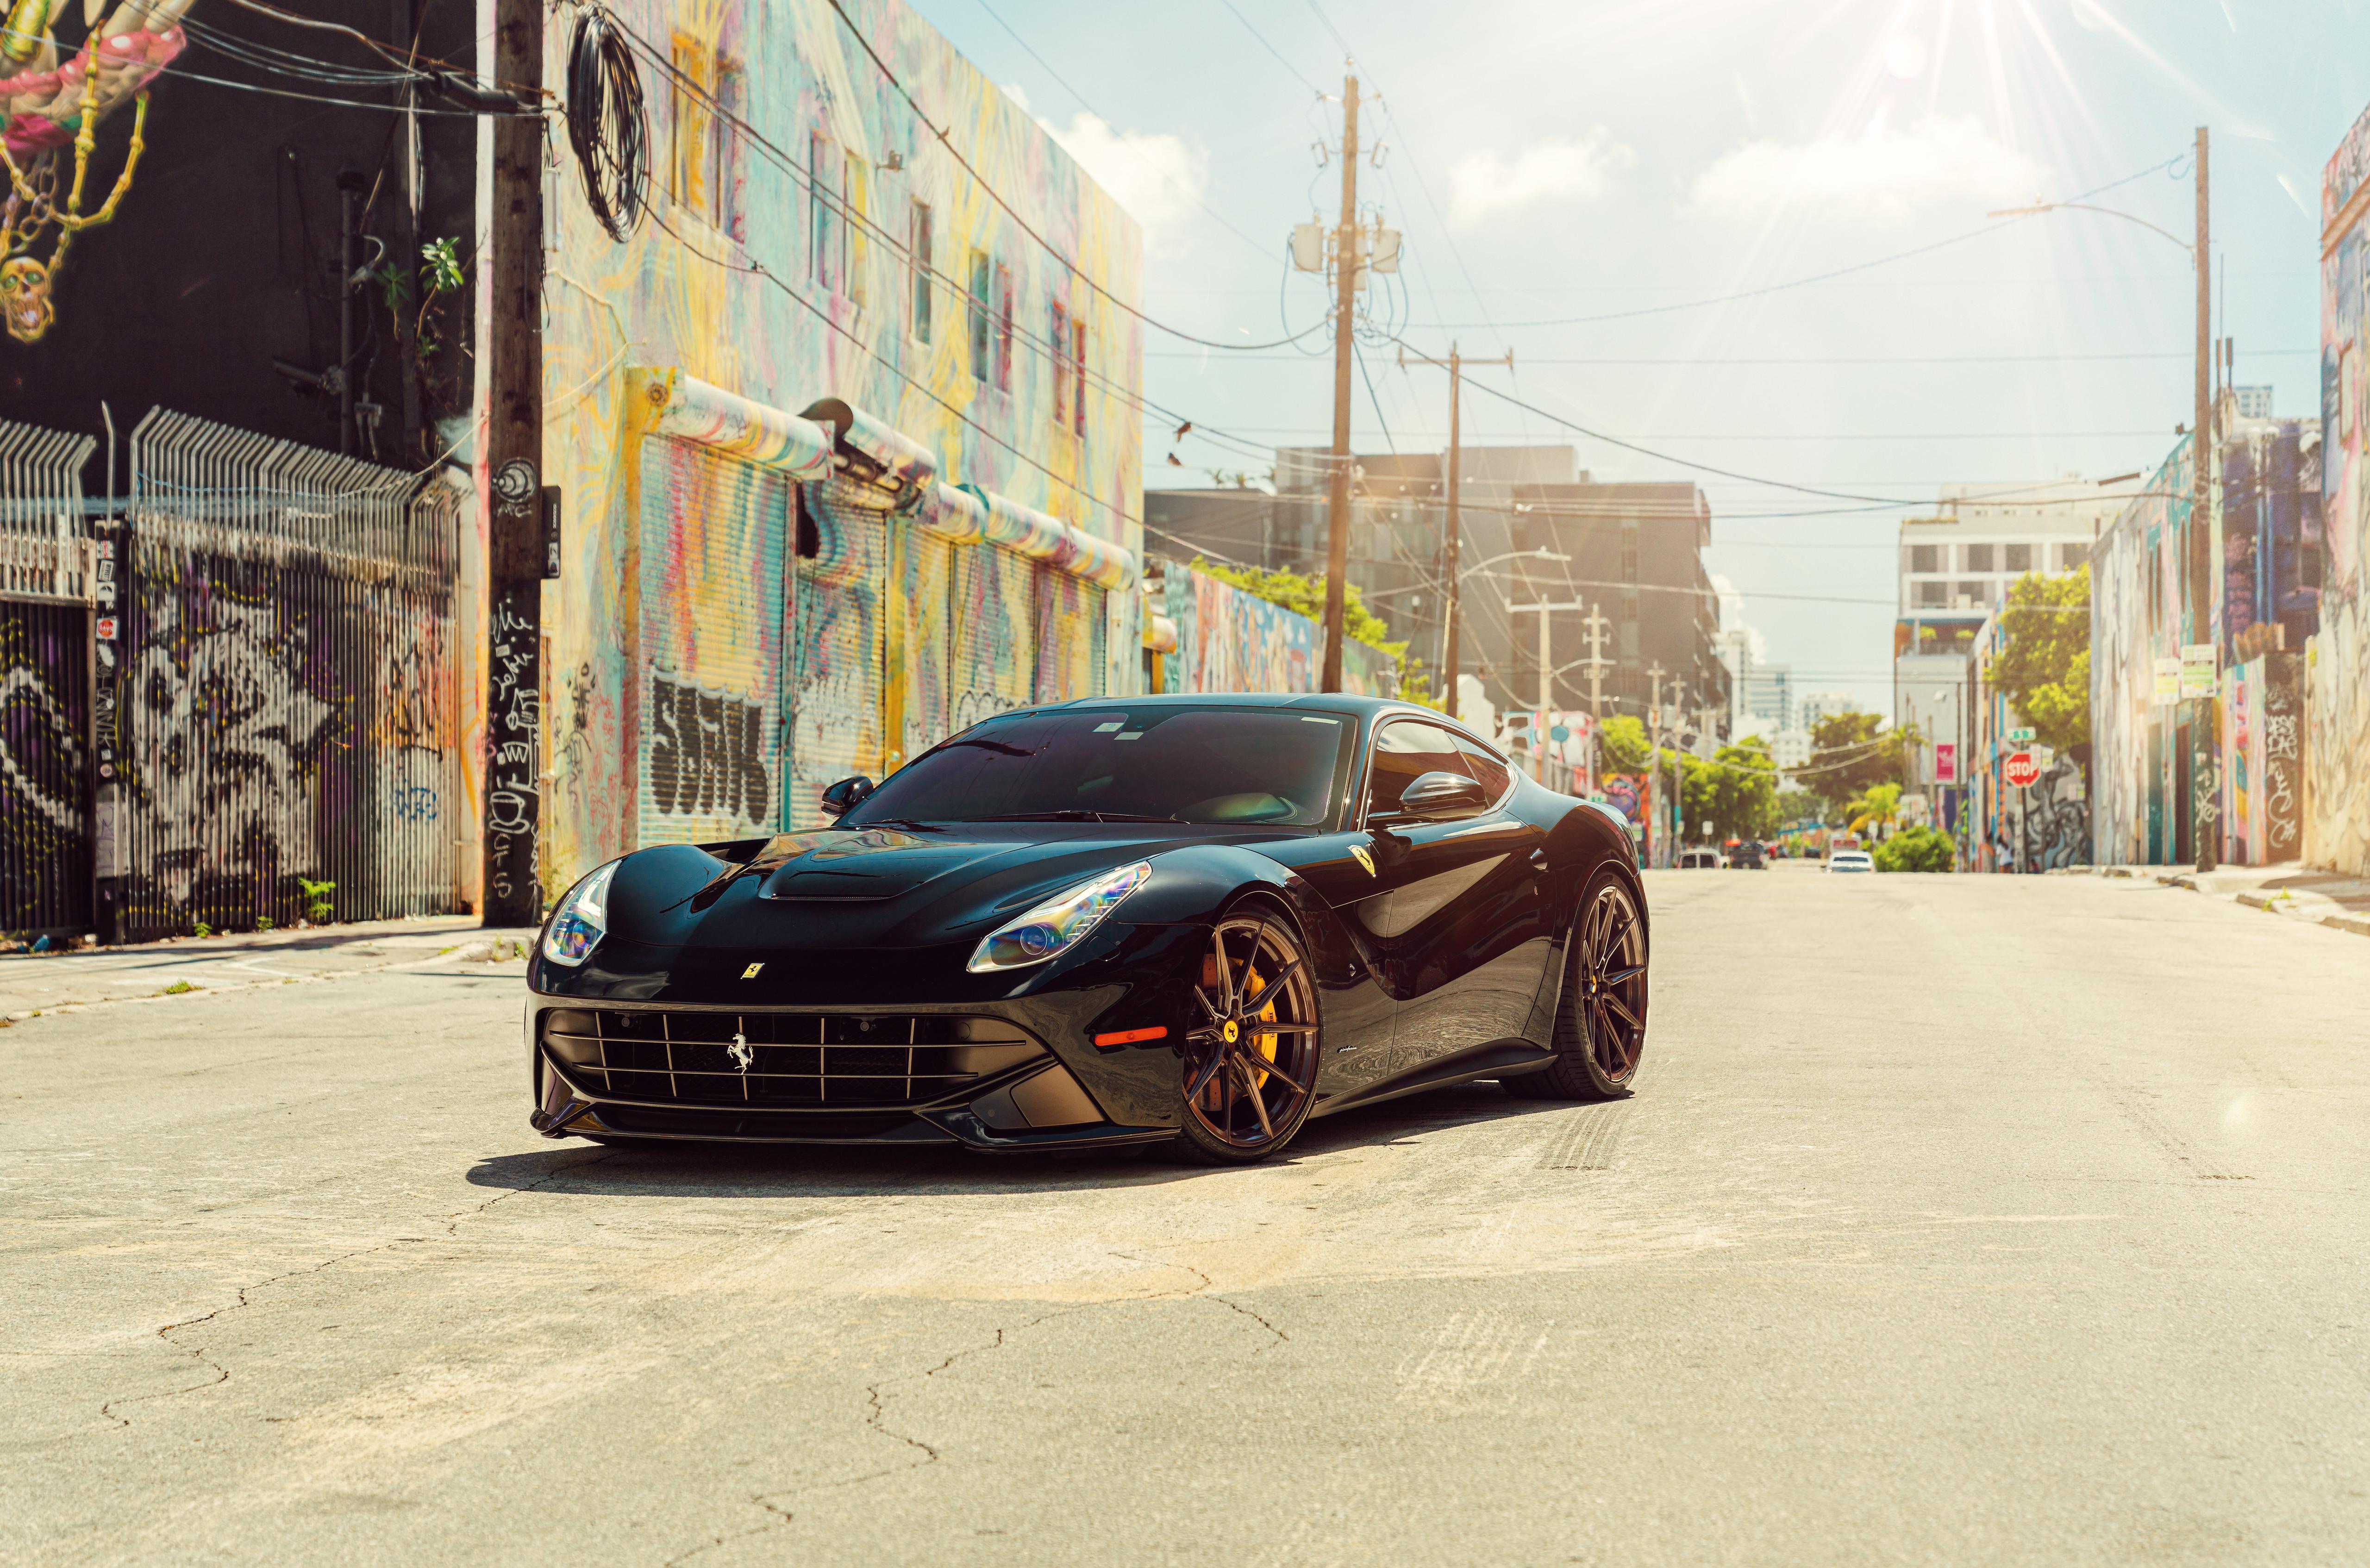 General 5119x3387 Ferrari Ferrari F12berlinetta automotive Vossen car